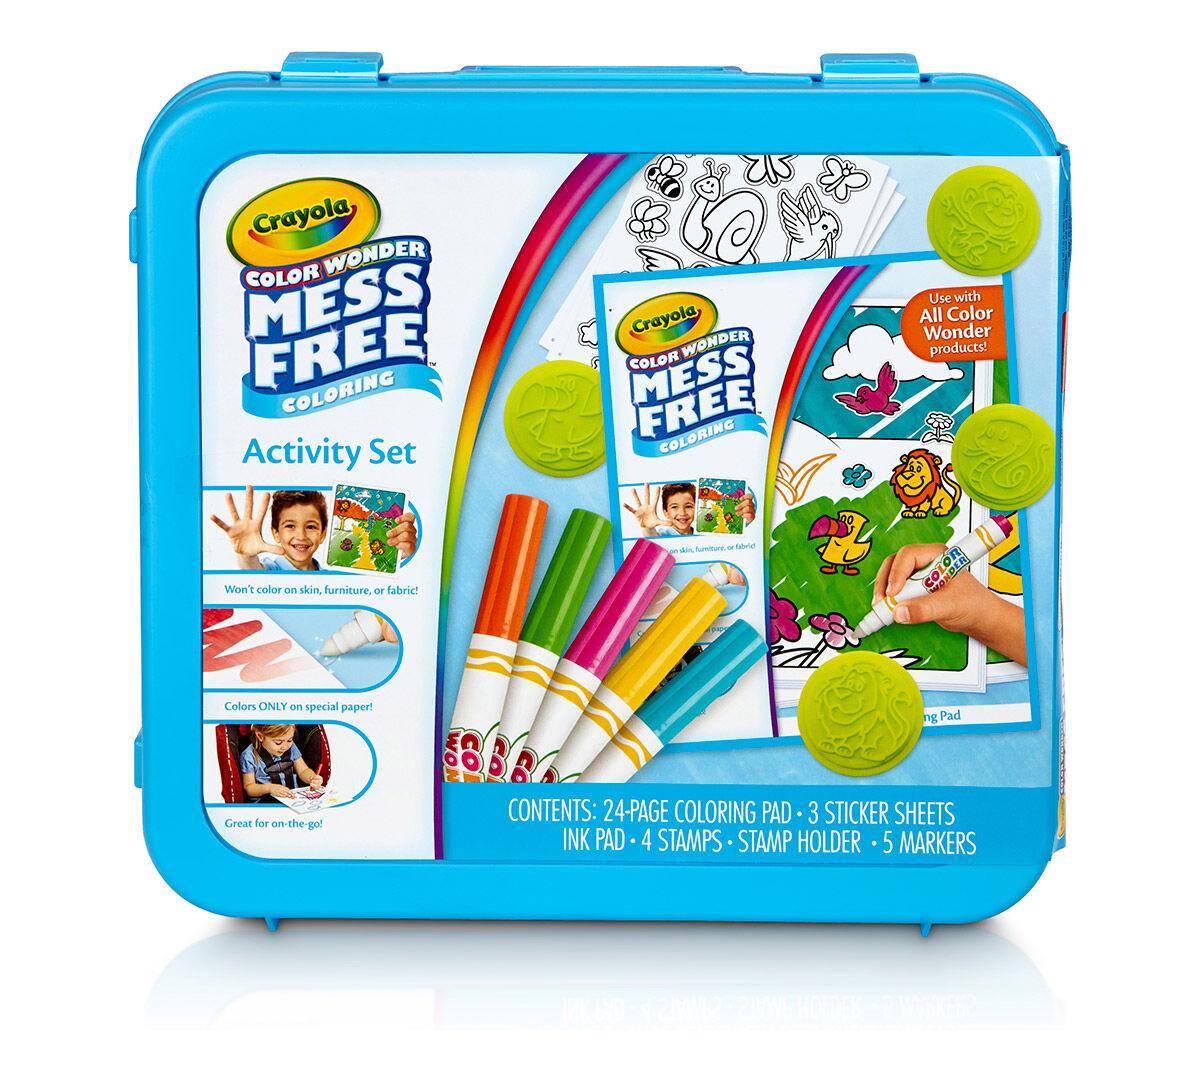 Color Wonder Mess Free Activity Set - Crayola